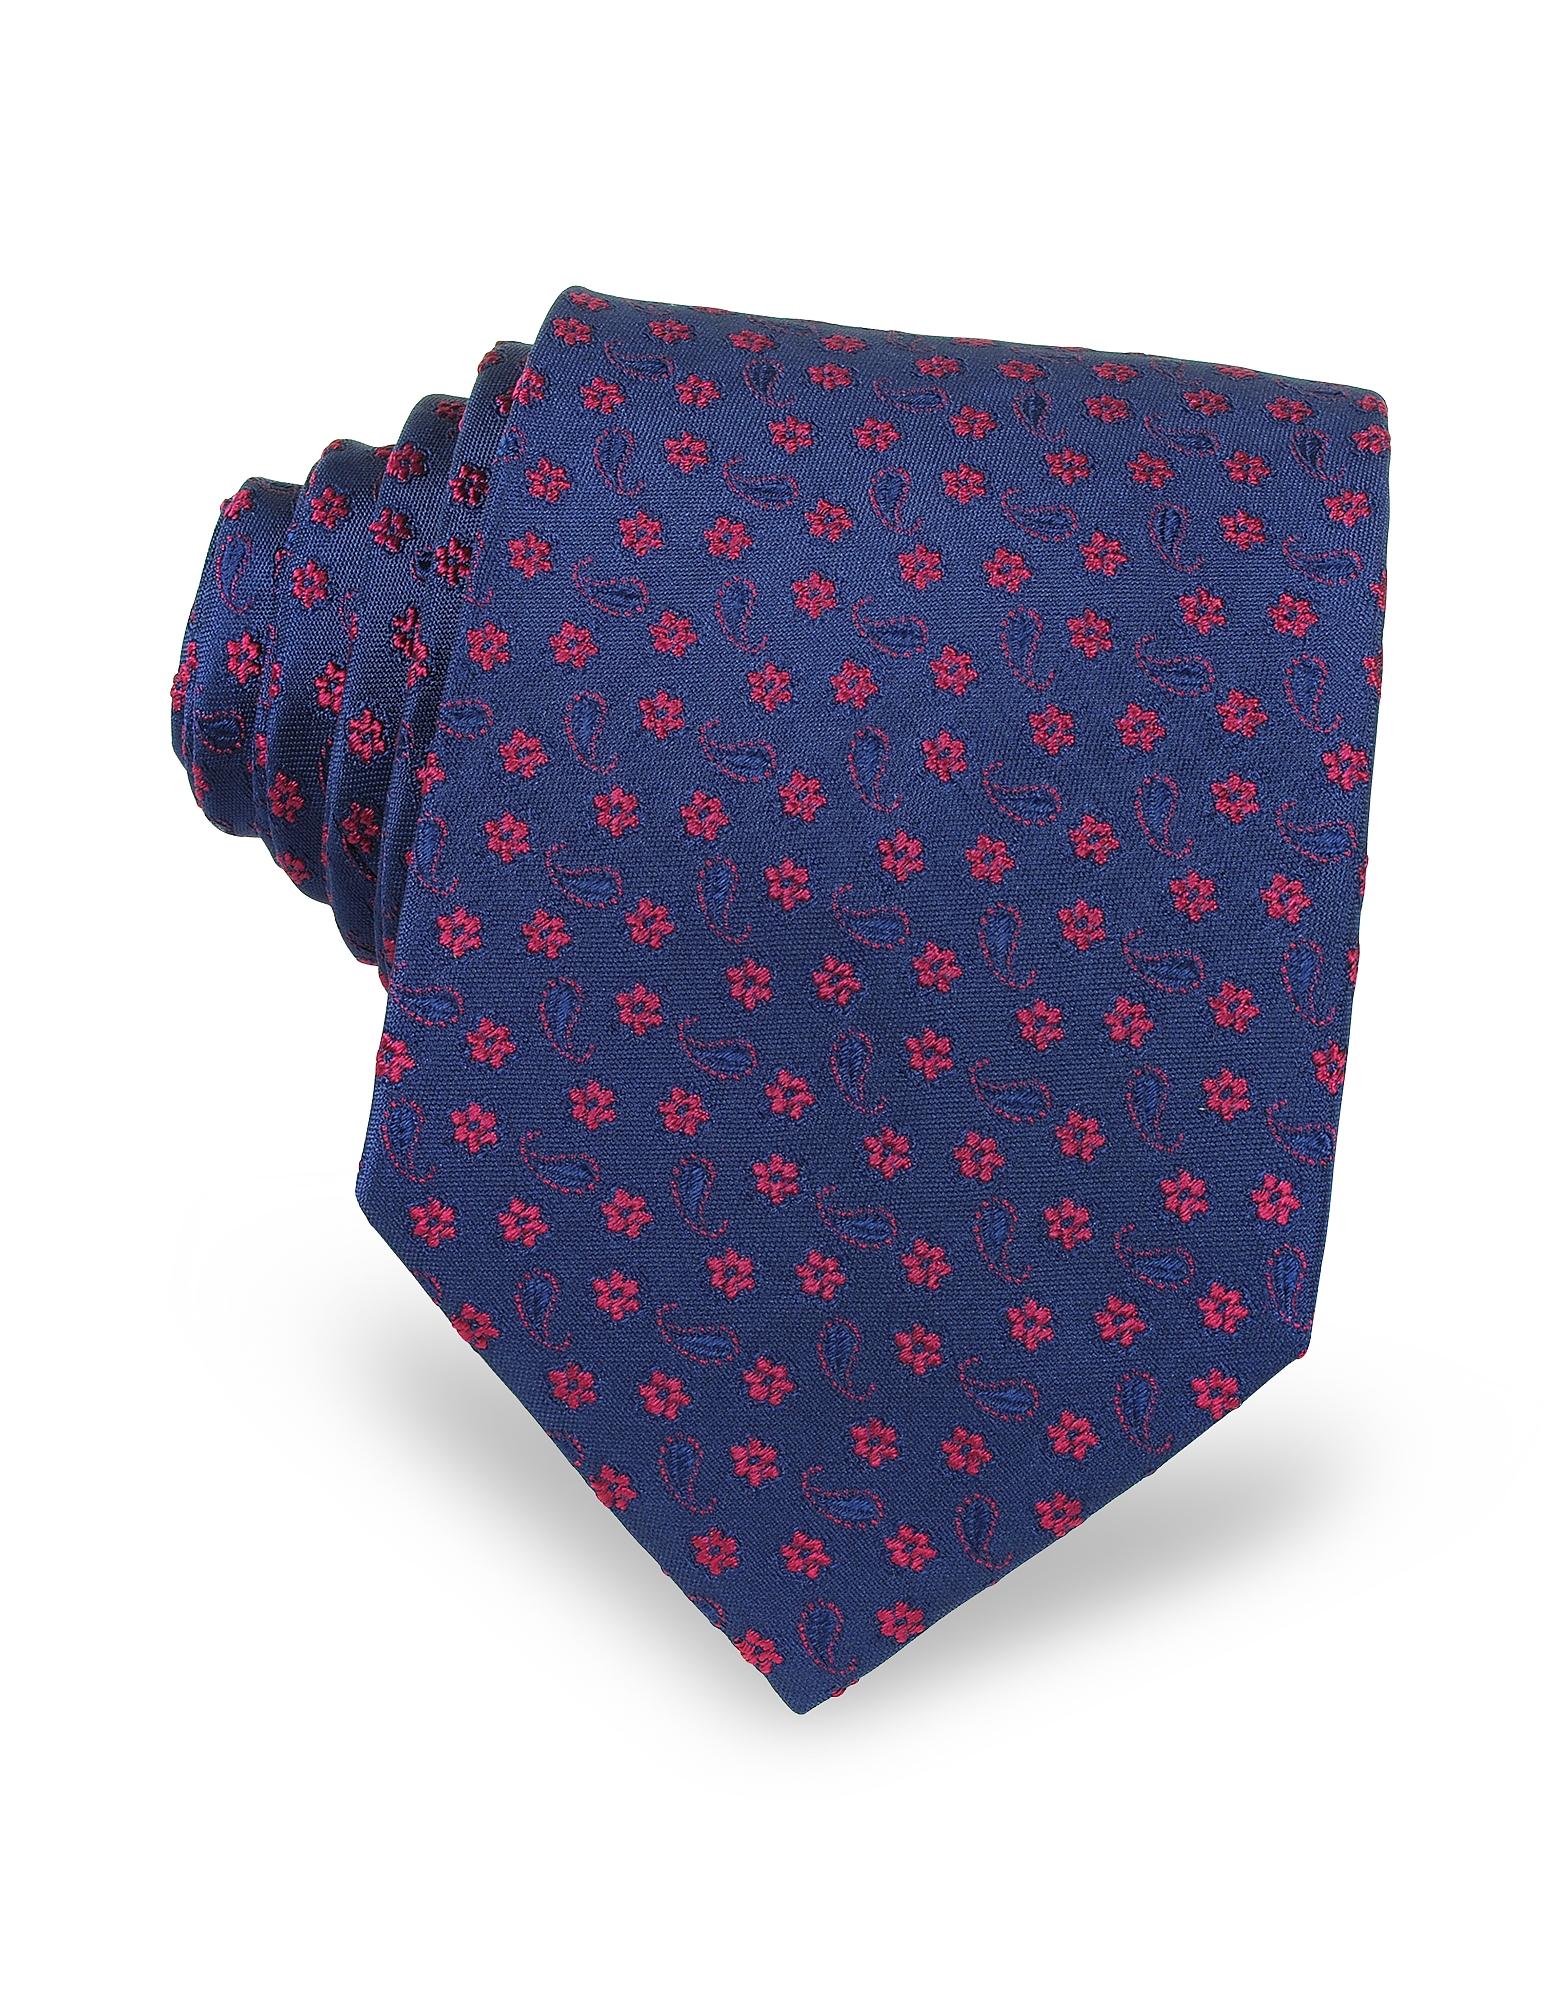 Cravatta da Uomo in Seta a Fiori/Cashmere